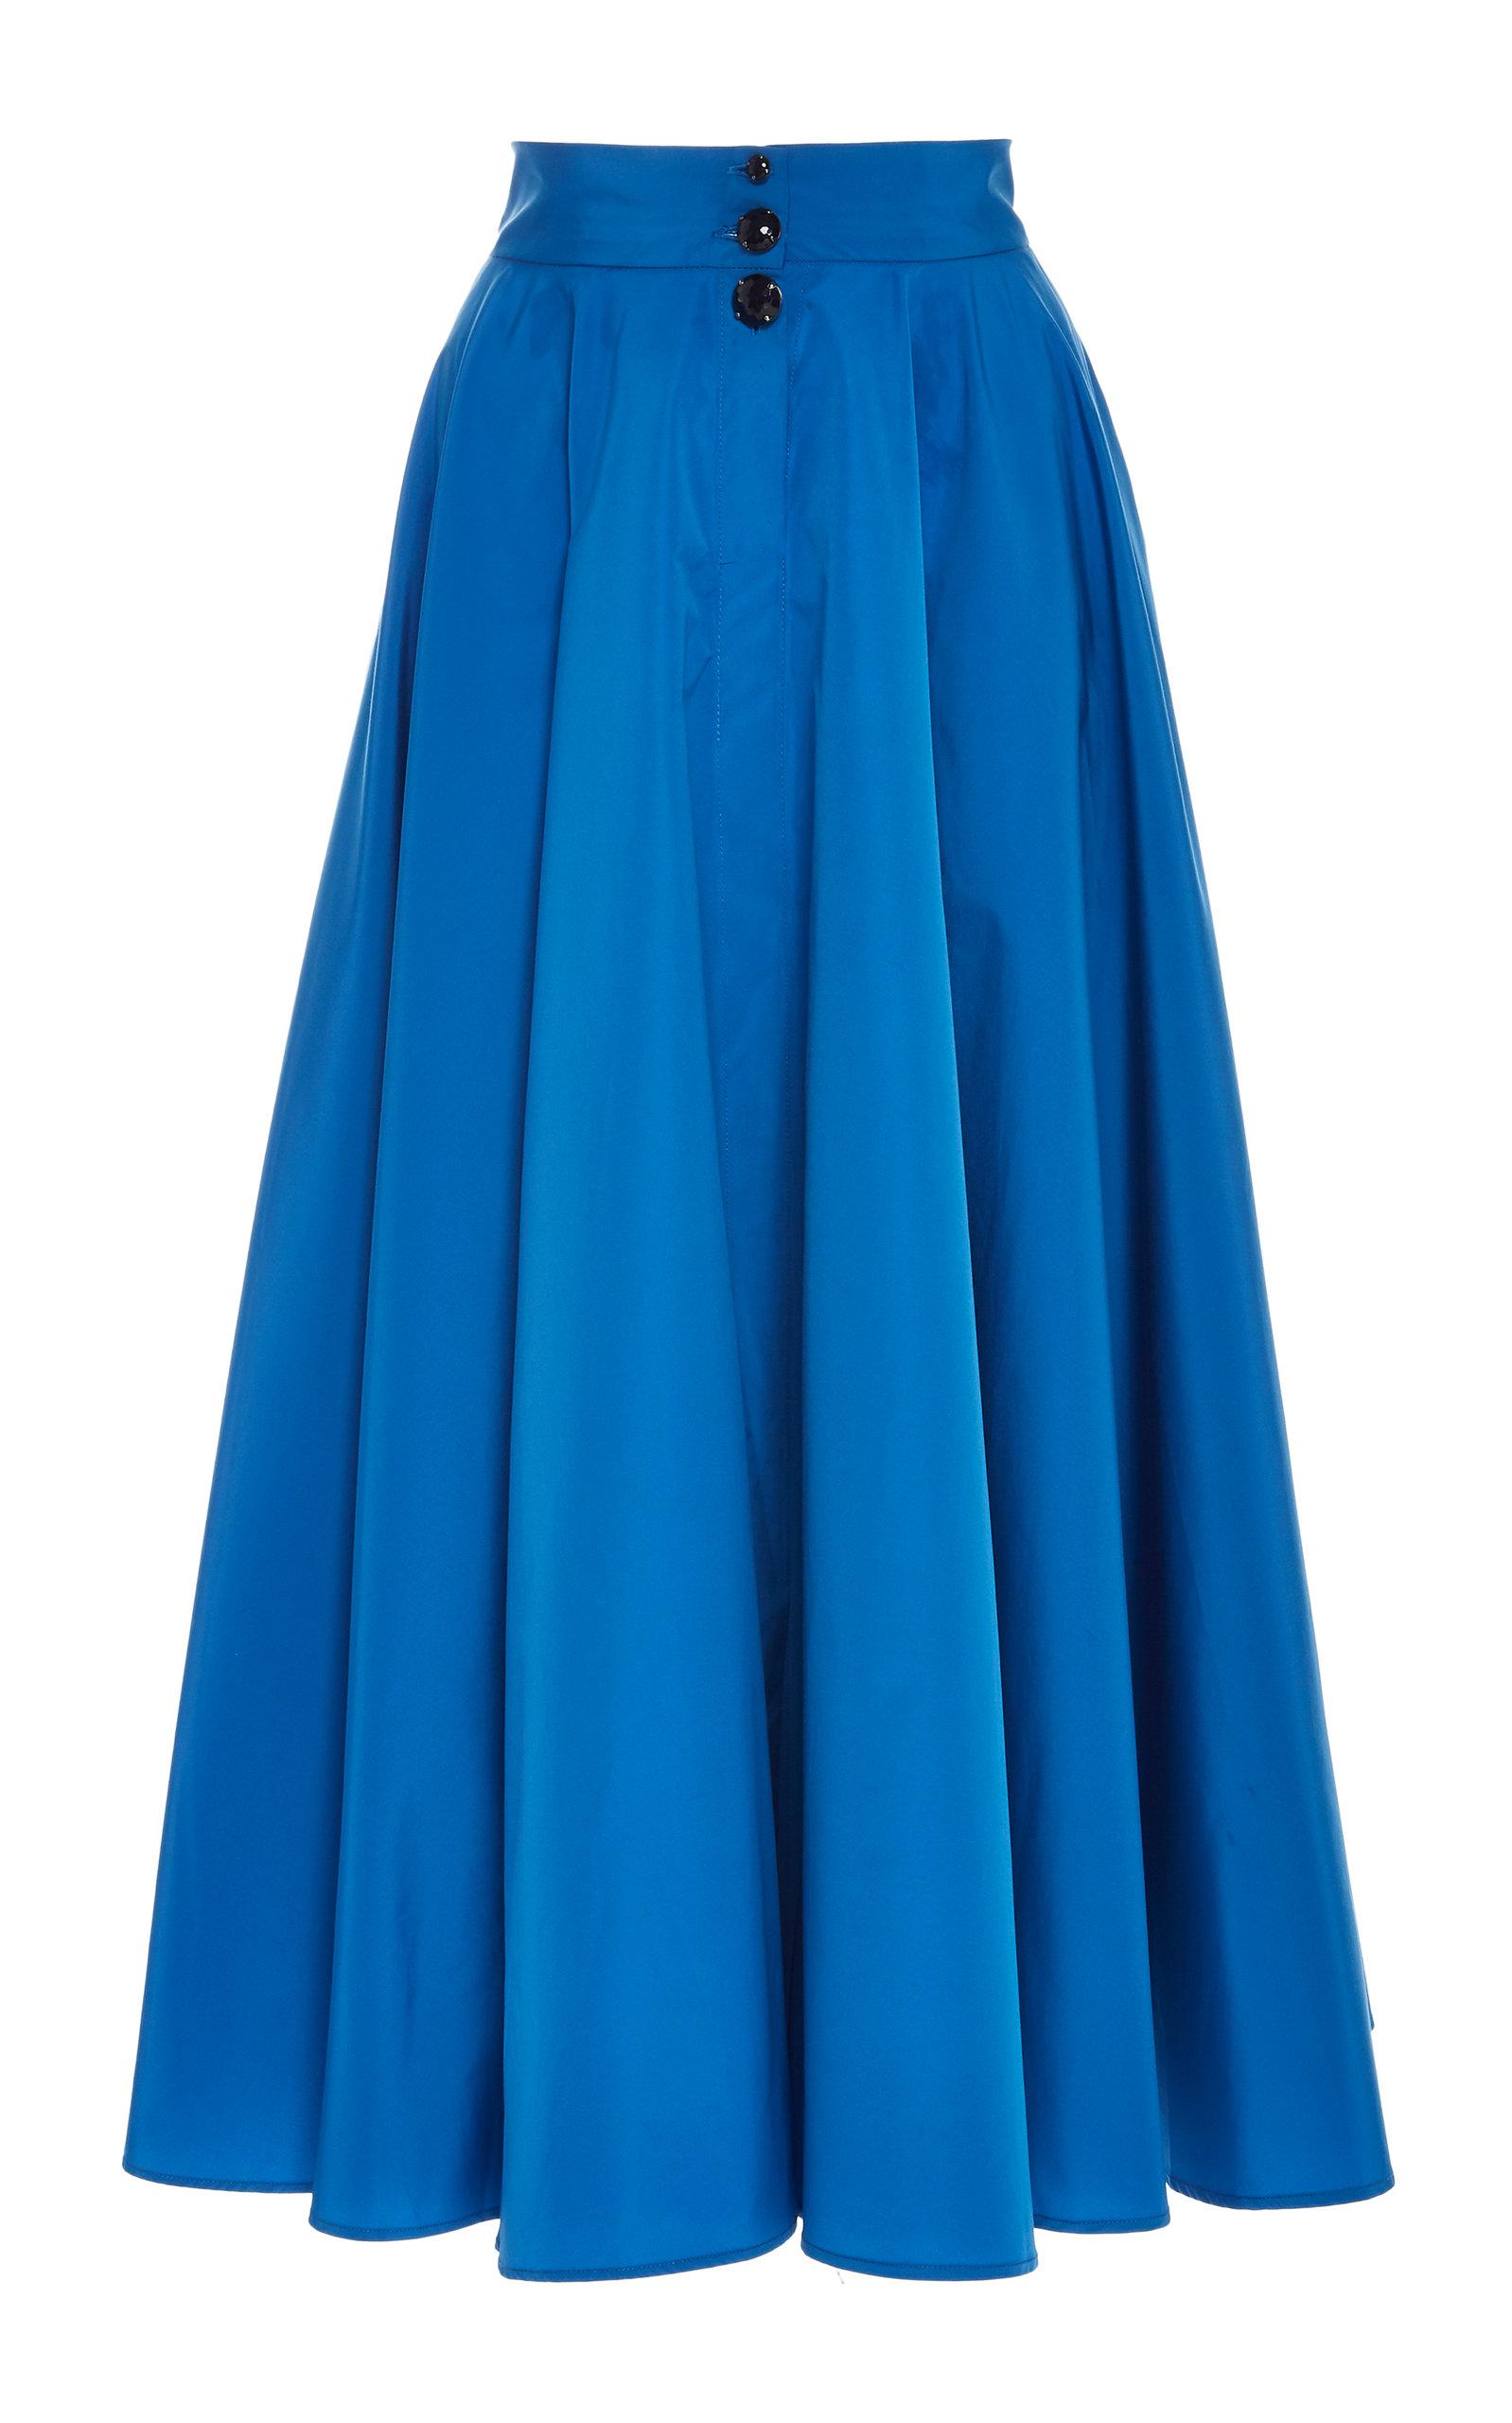 CHADOR Kelly B A-Line Midi Skirt in Blue